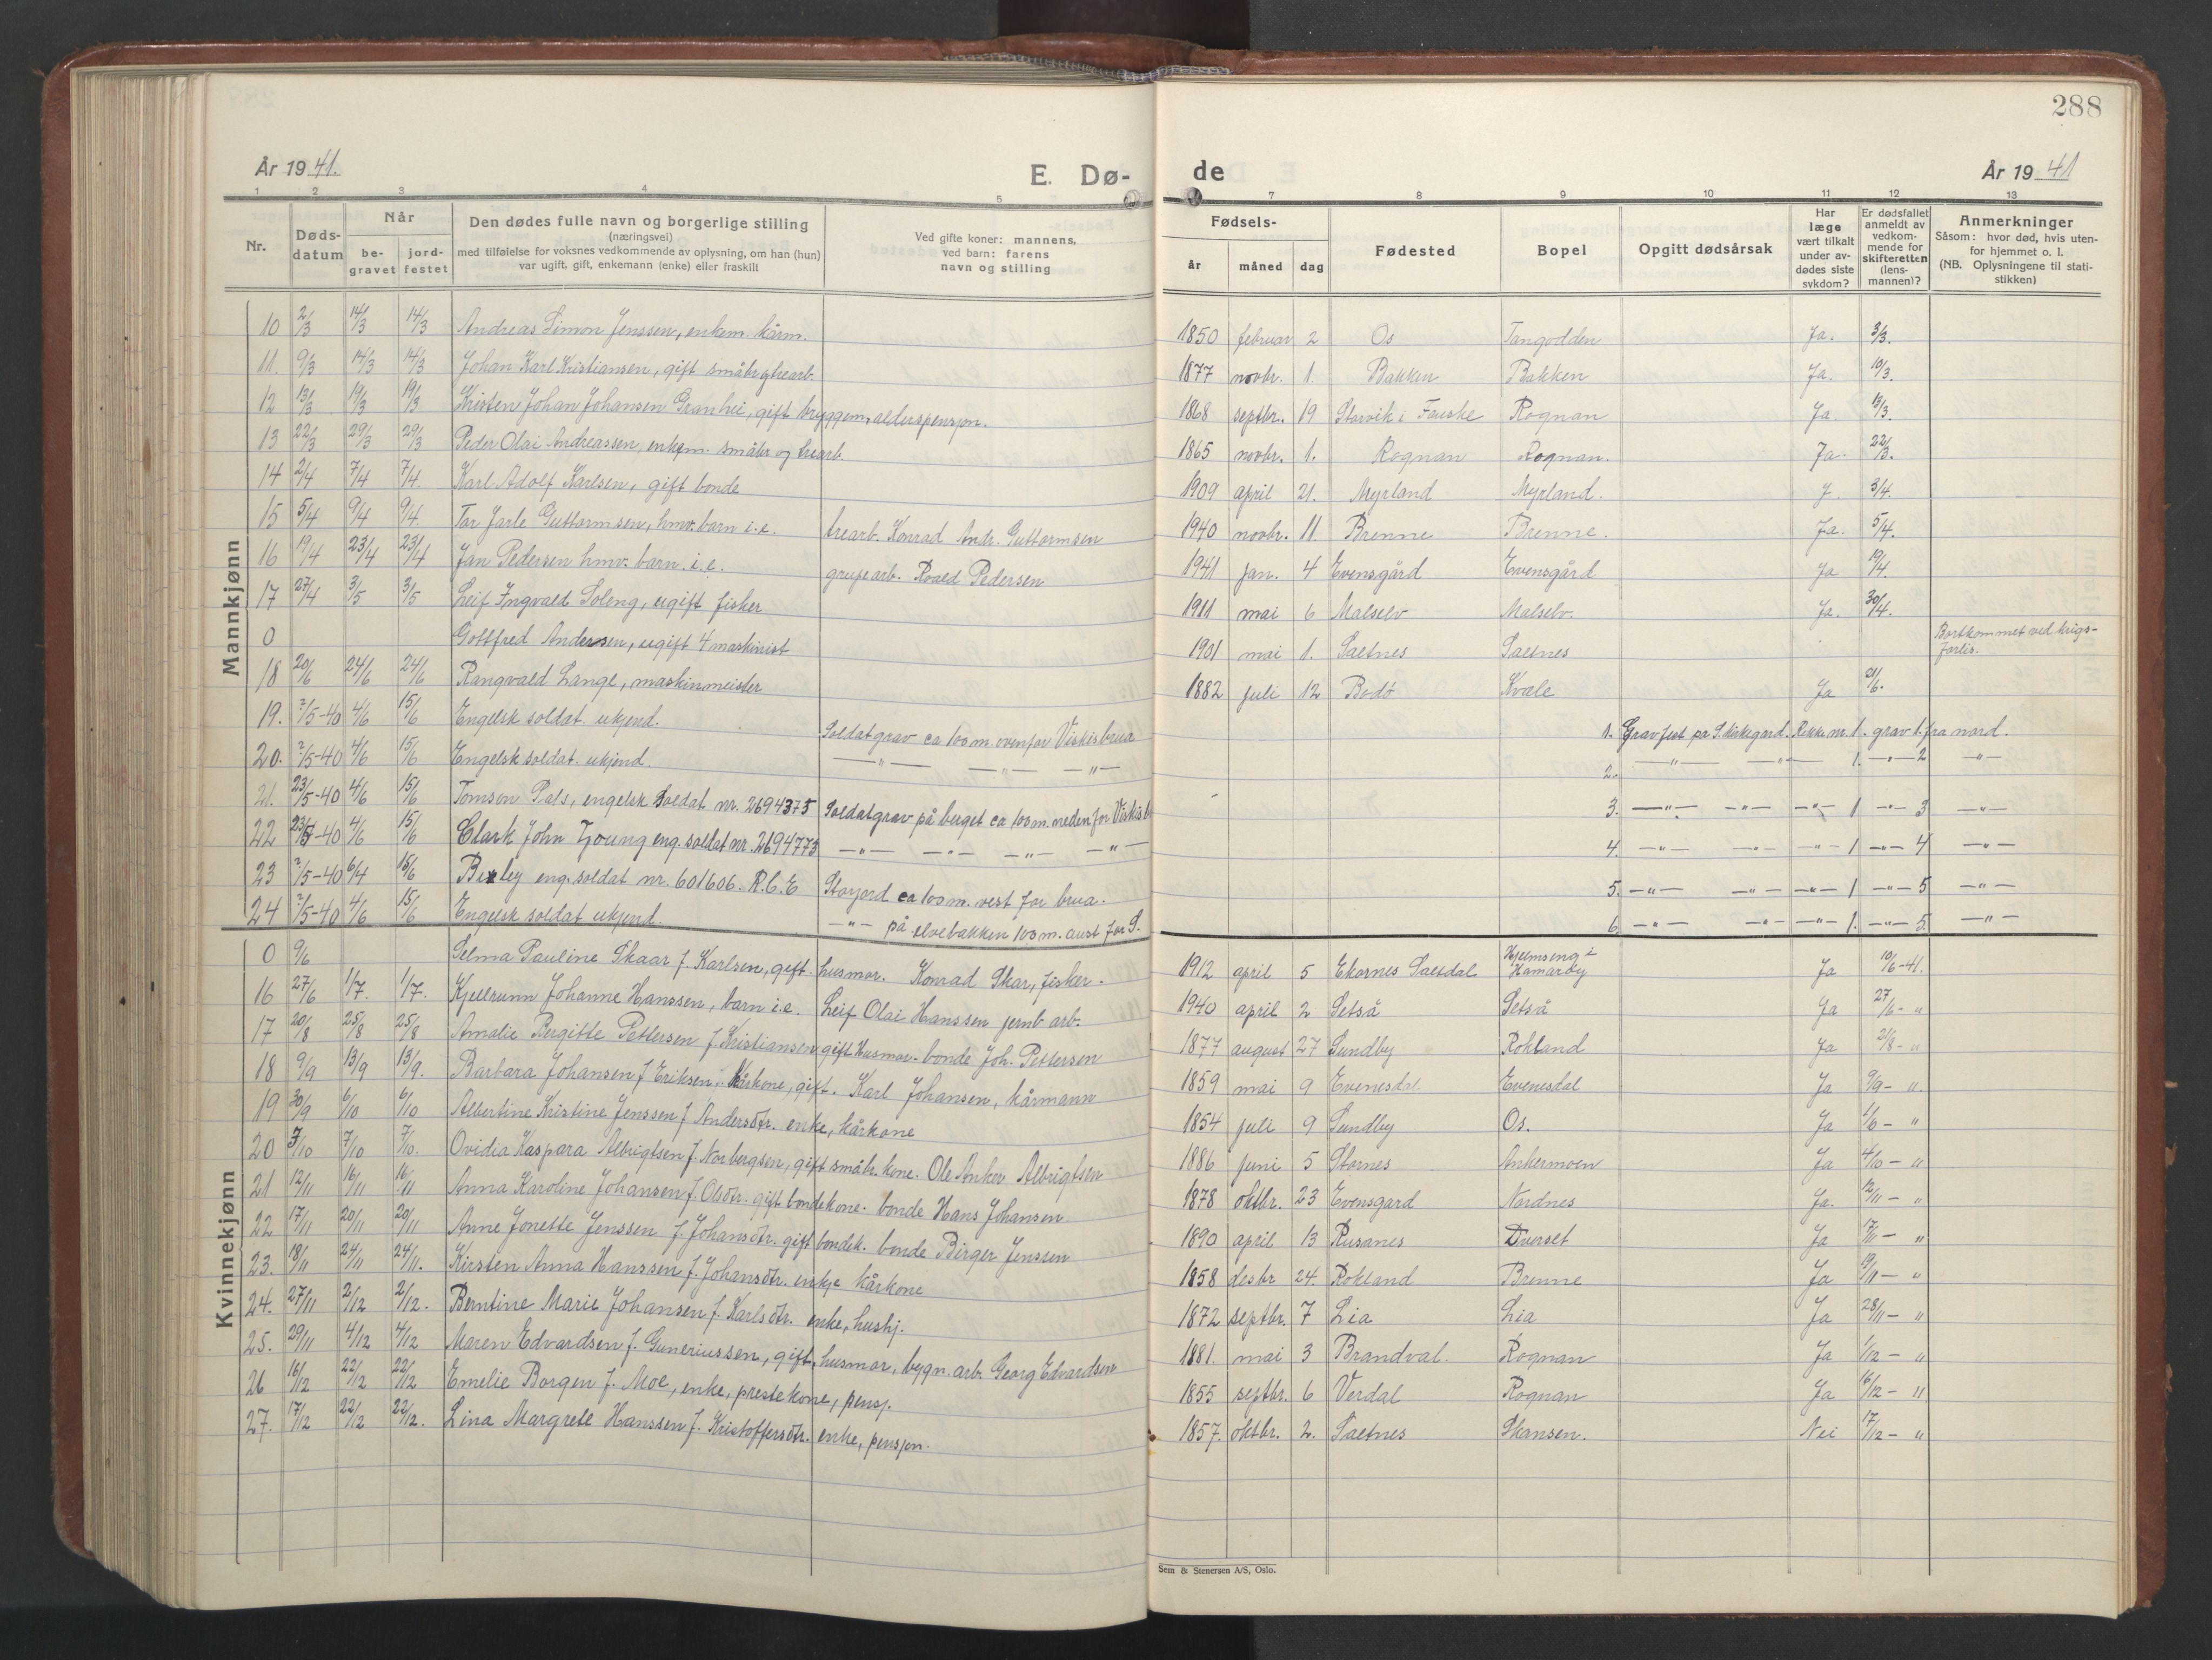 SAT, Ministerialprotokoller, klokkerbøker og fødselsregistre - Nordland, 847/L0680: Klokkerbok nr. 847C08, 1930-1947, s. 288